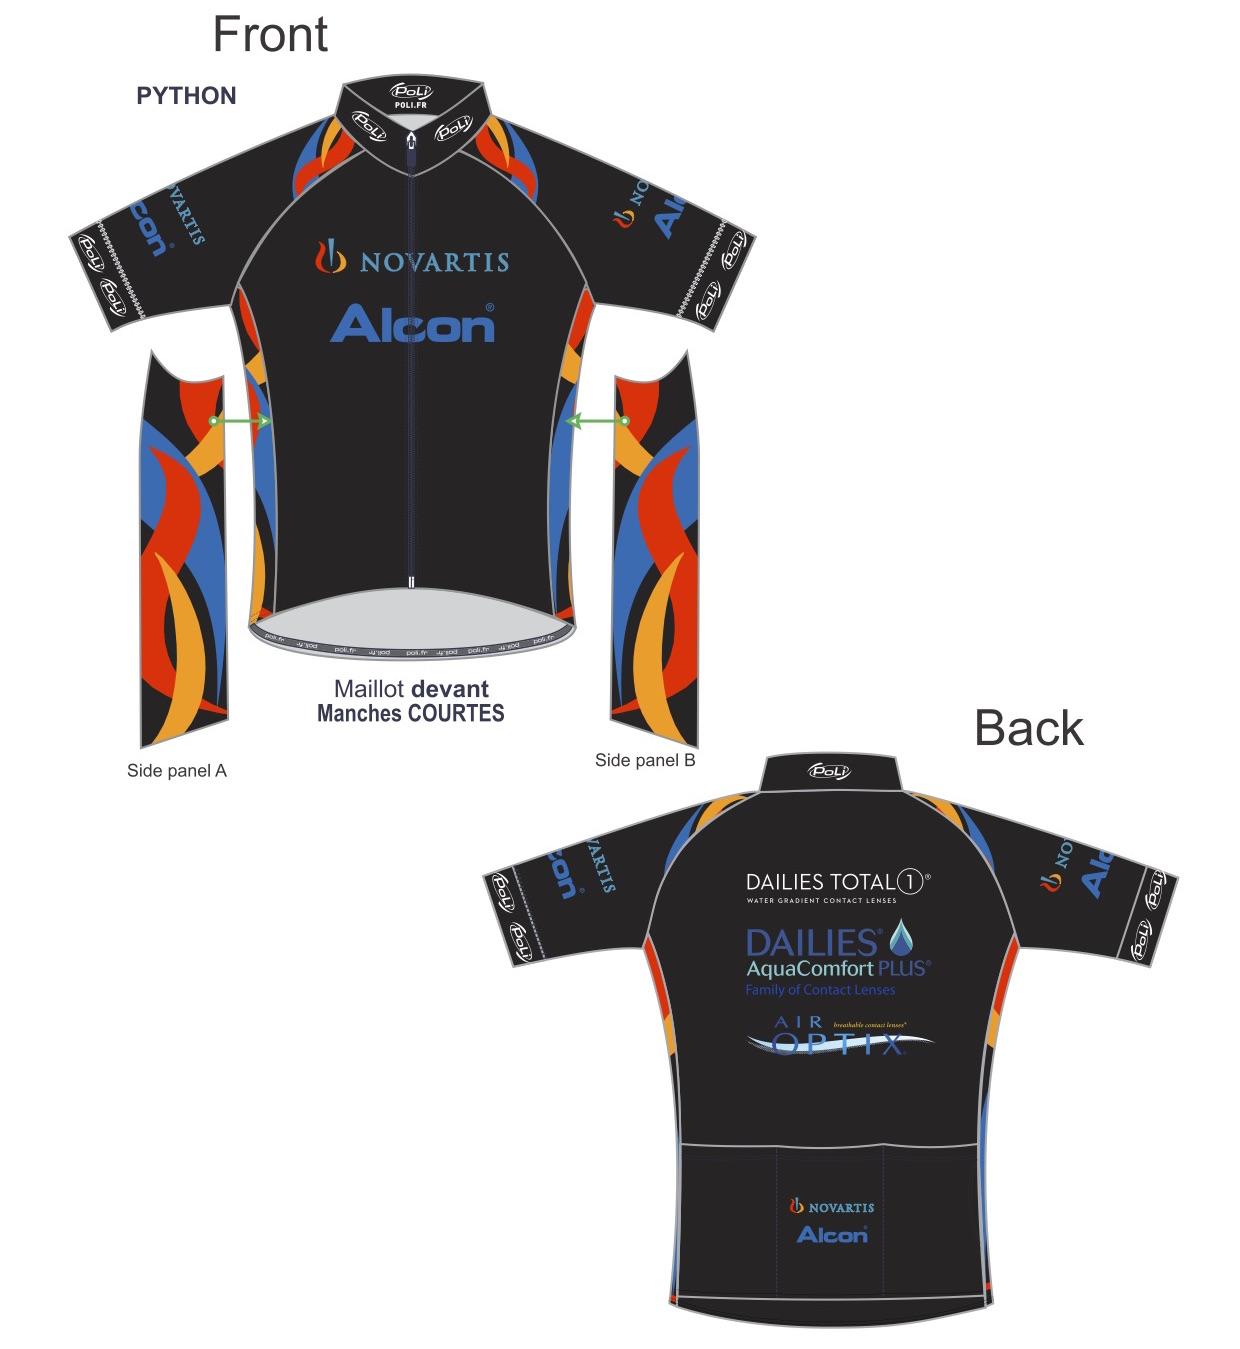 Alcon Novartis Cycling Kit